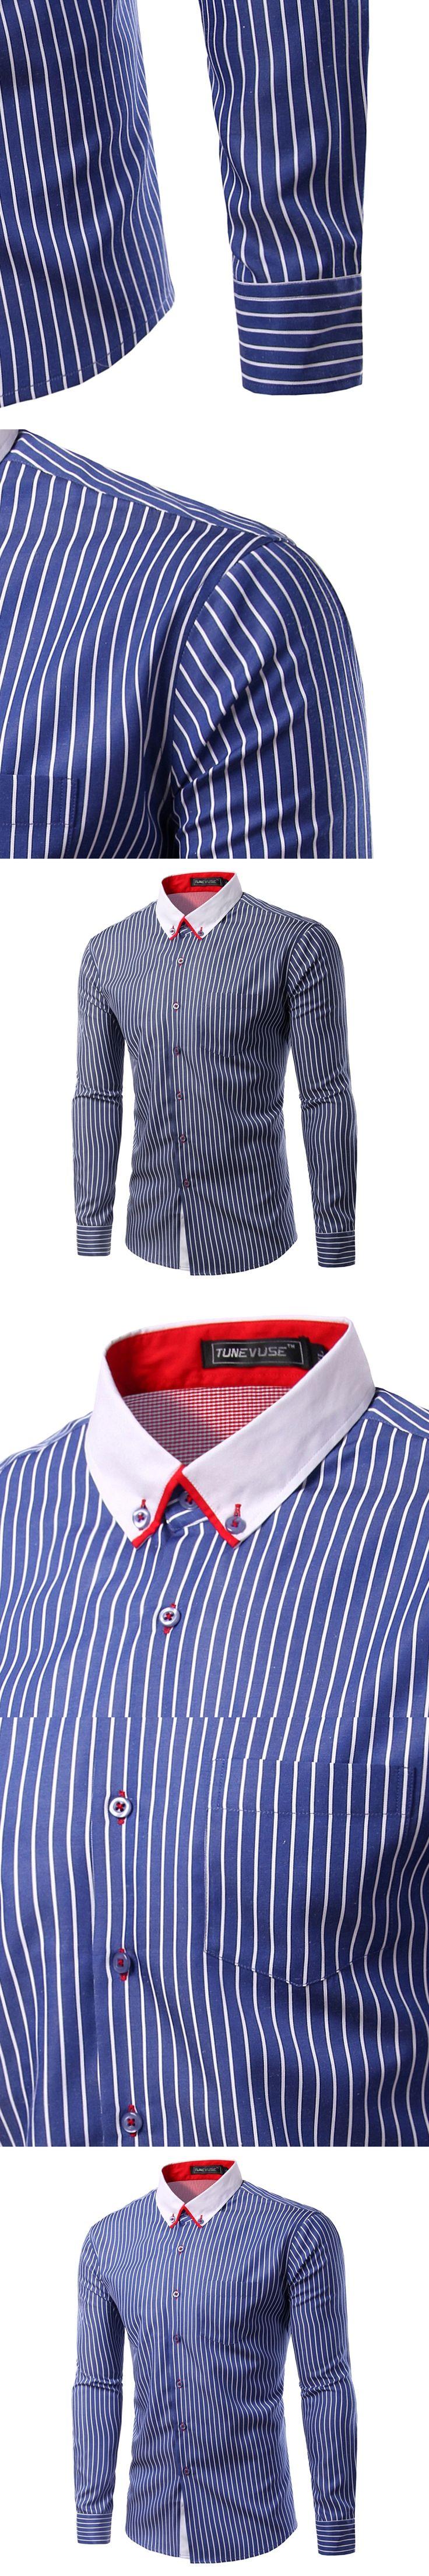 Fashion 2017 Men Shirts Male Striped Formal Dress Shirt Long Sleeve Mens Brand Casual Camisa Masculina Plus Asian Size 3XL TU220